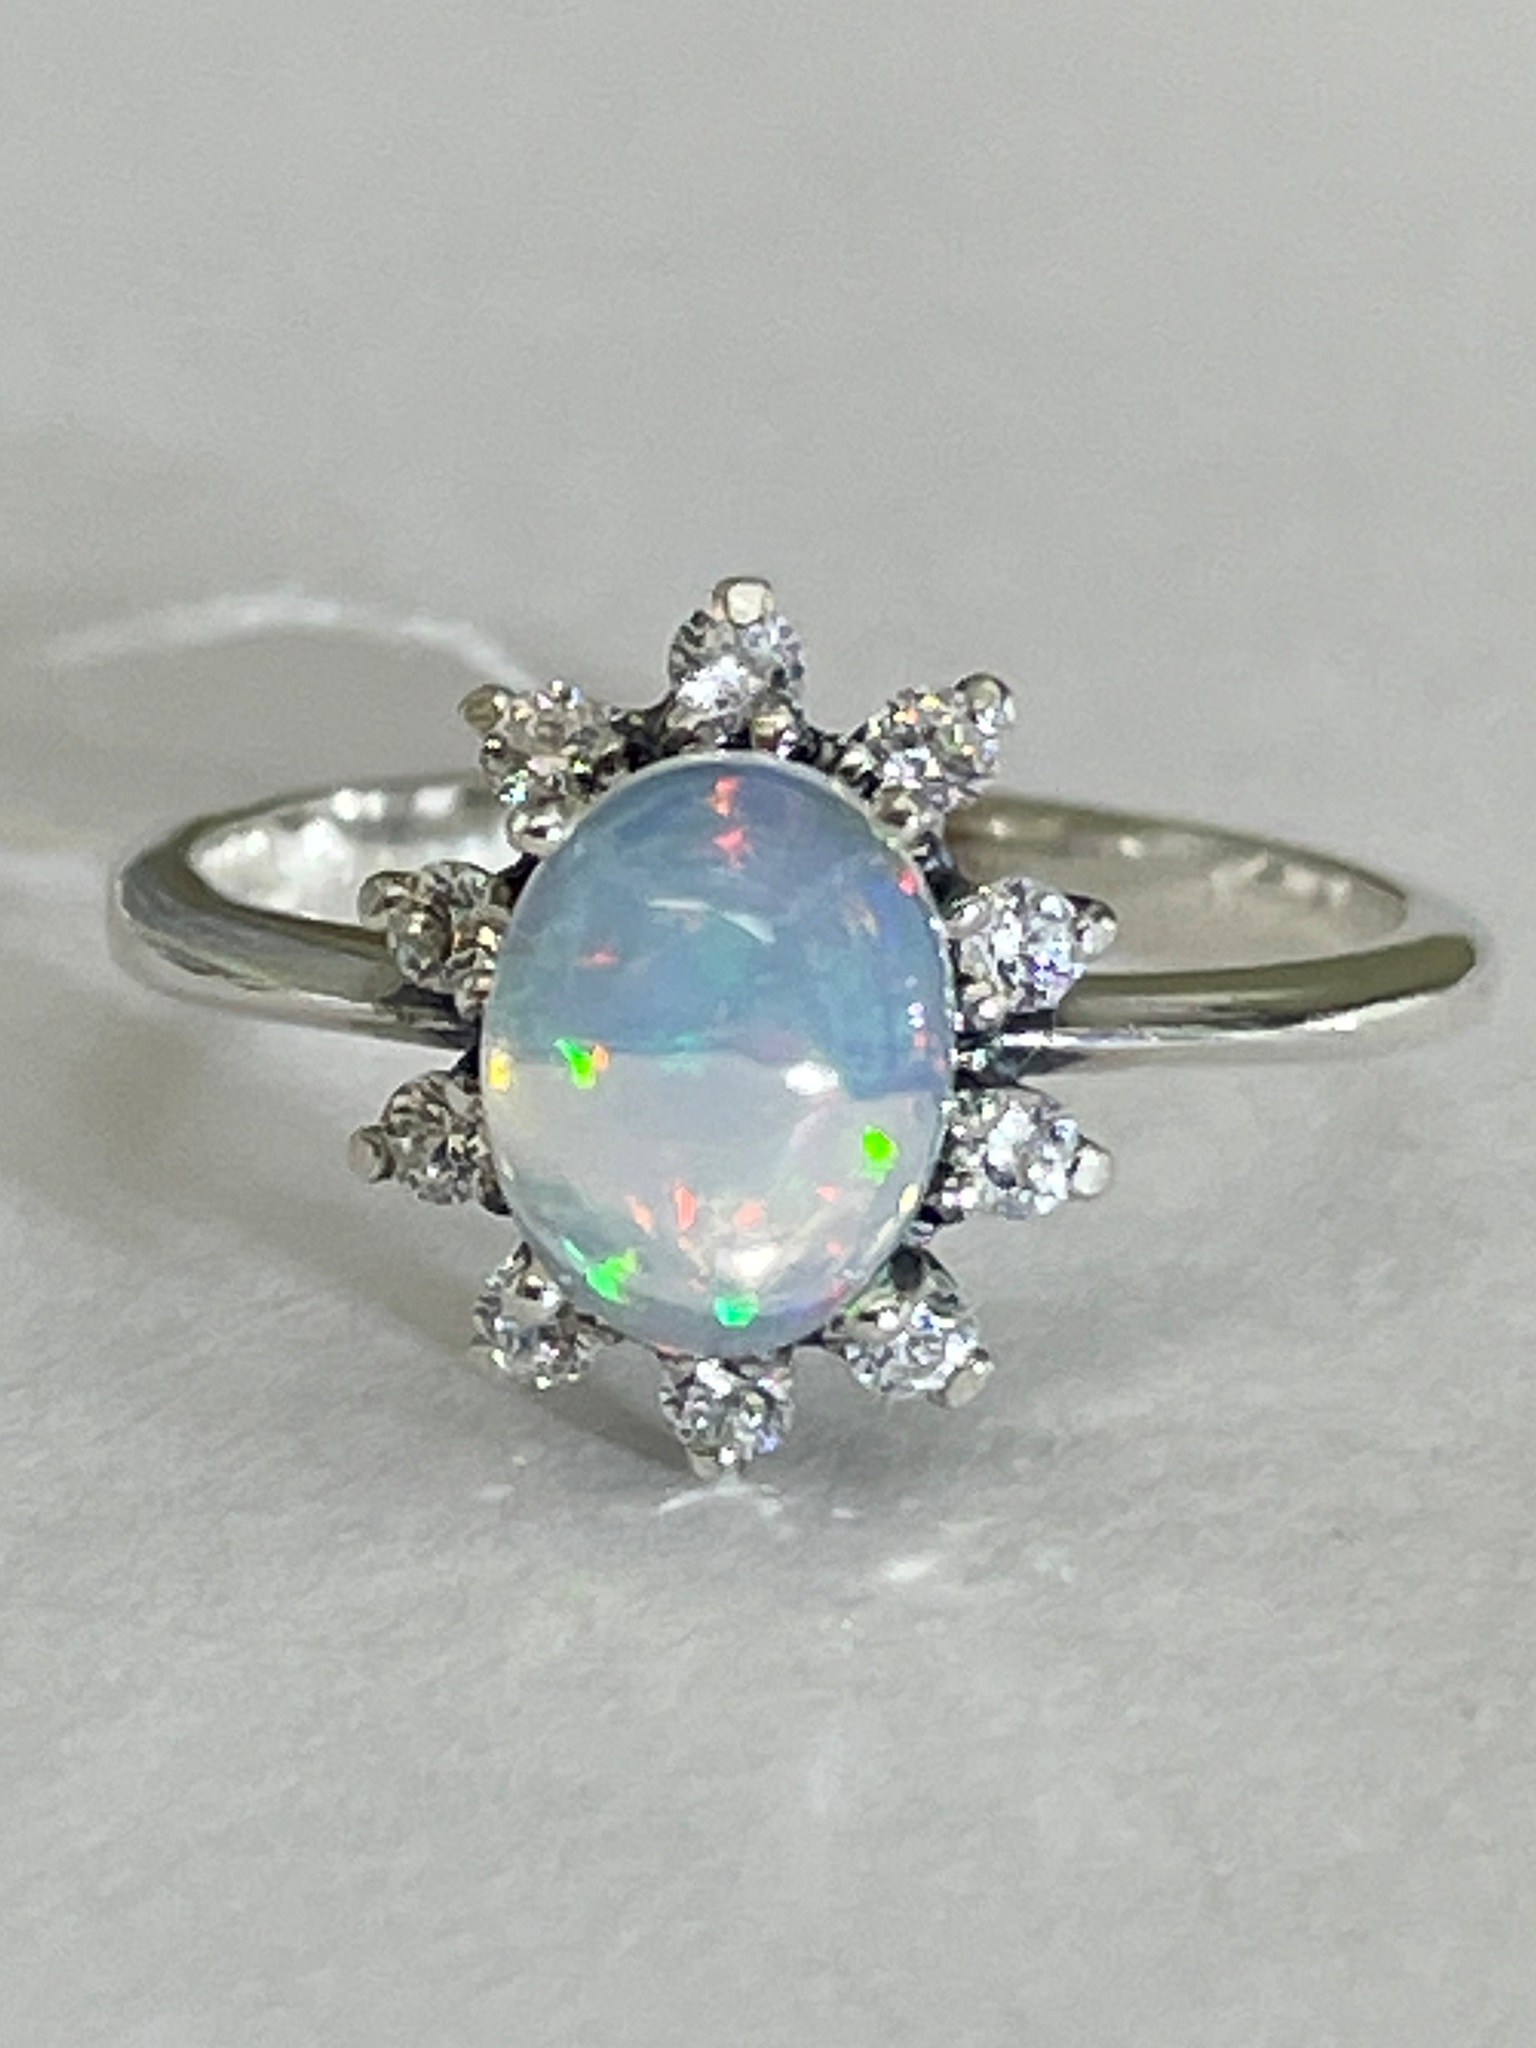 Ежик-опал (кольцо из серебра)